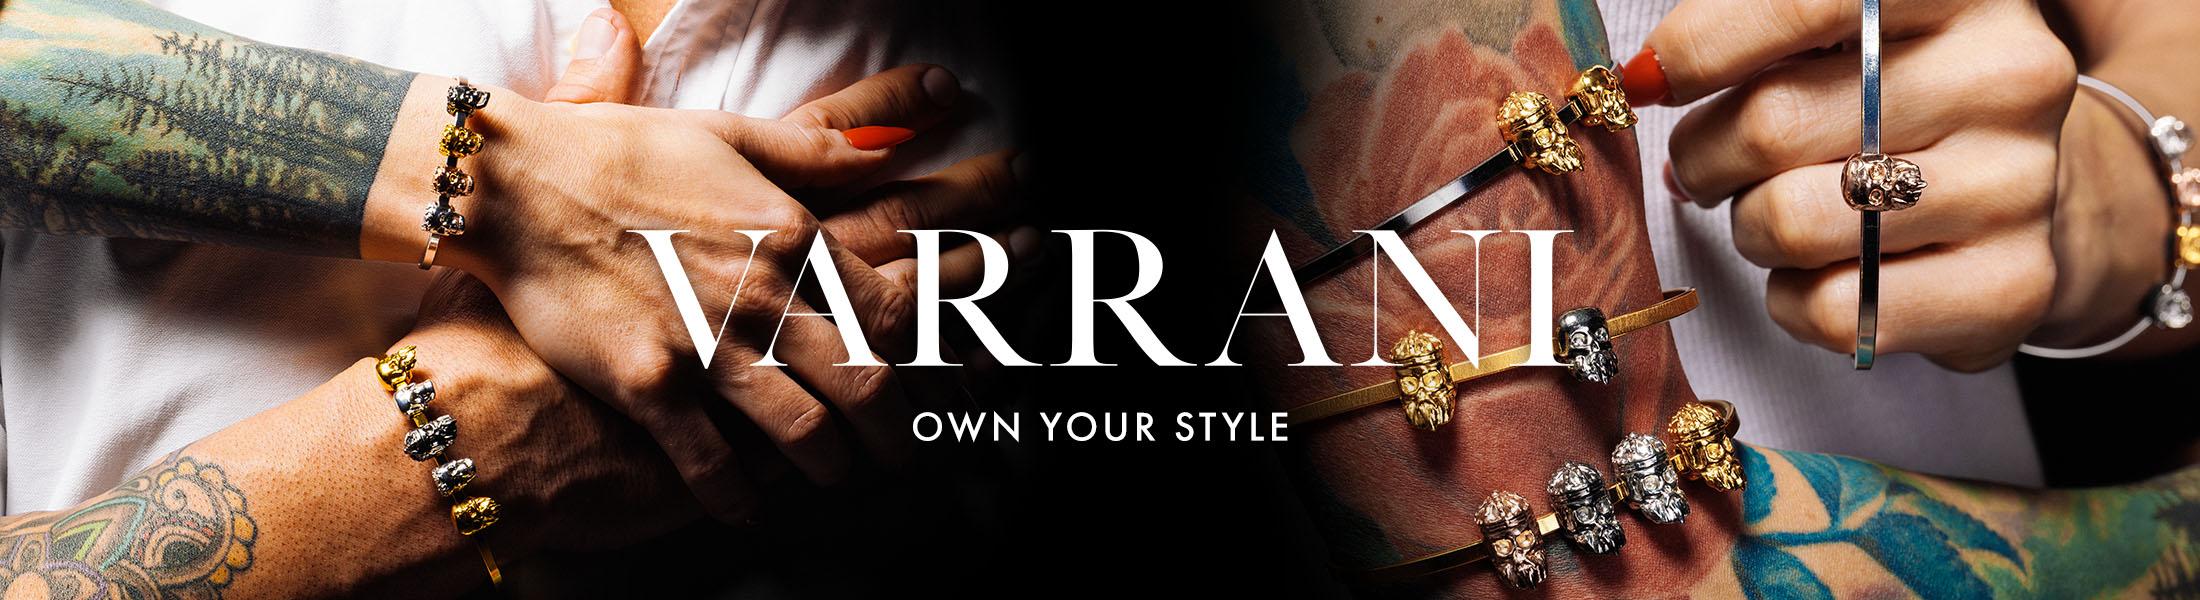 VARRANI Collection